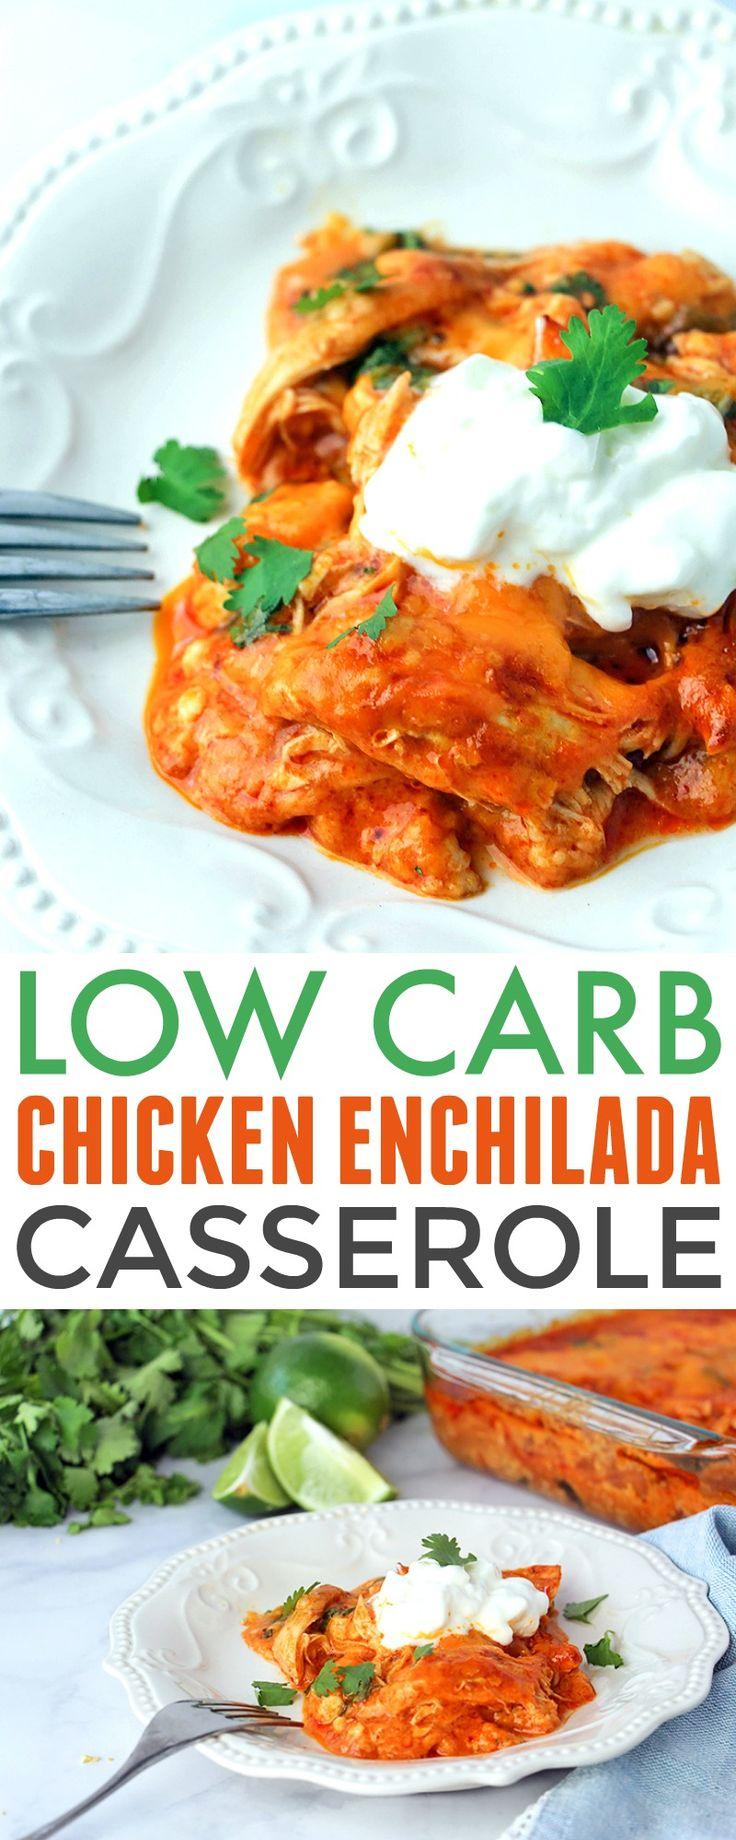 Low Carb Chicken Enchilada Casserole - #lowcarb #lowcarbrecipes #keto #casserole #mexican #dinner #enchiladas #ketogenic #dinnerideas #recipe